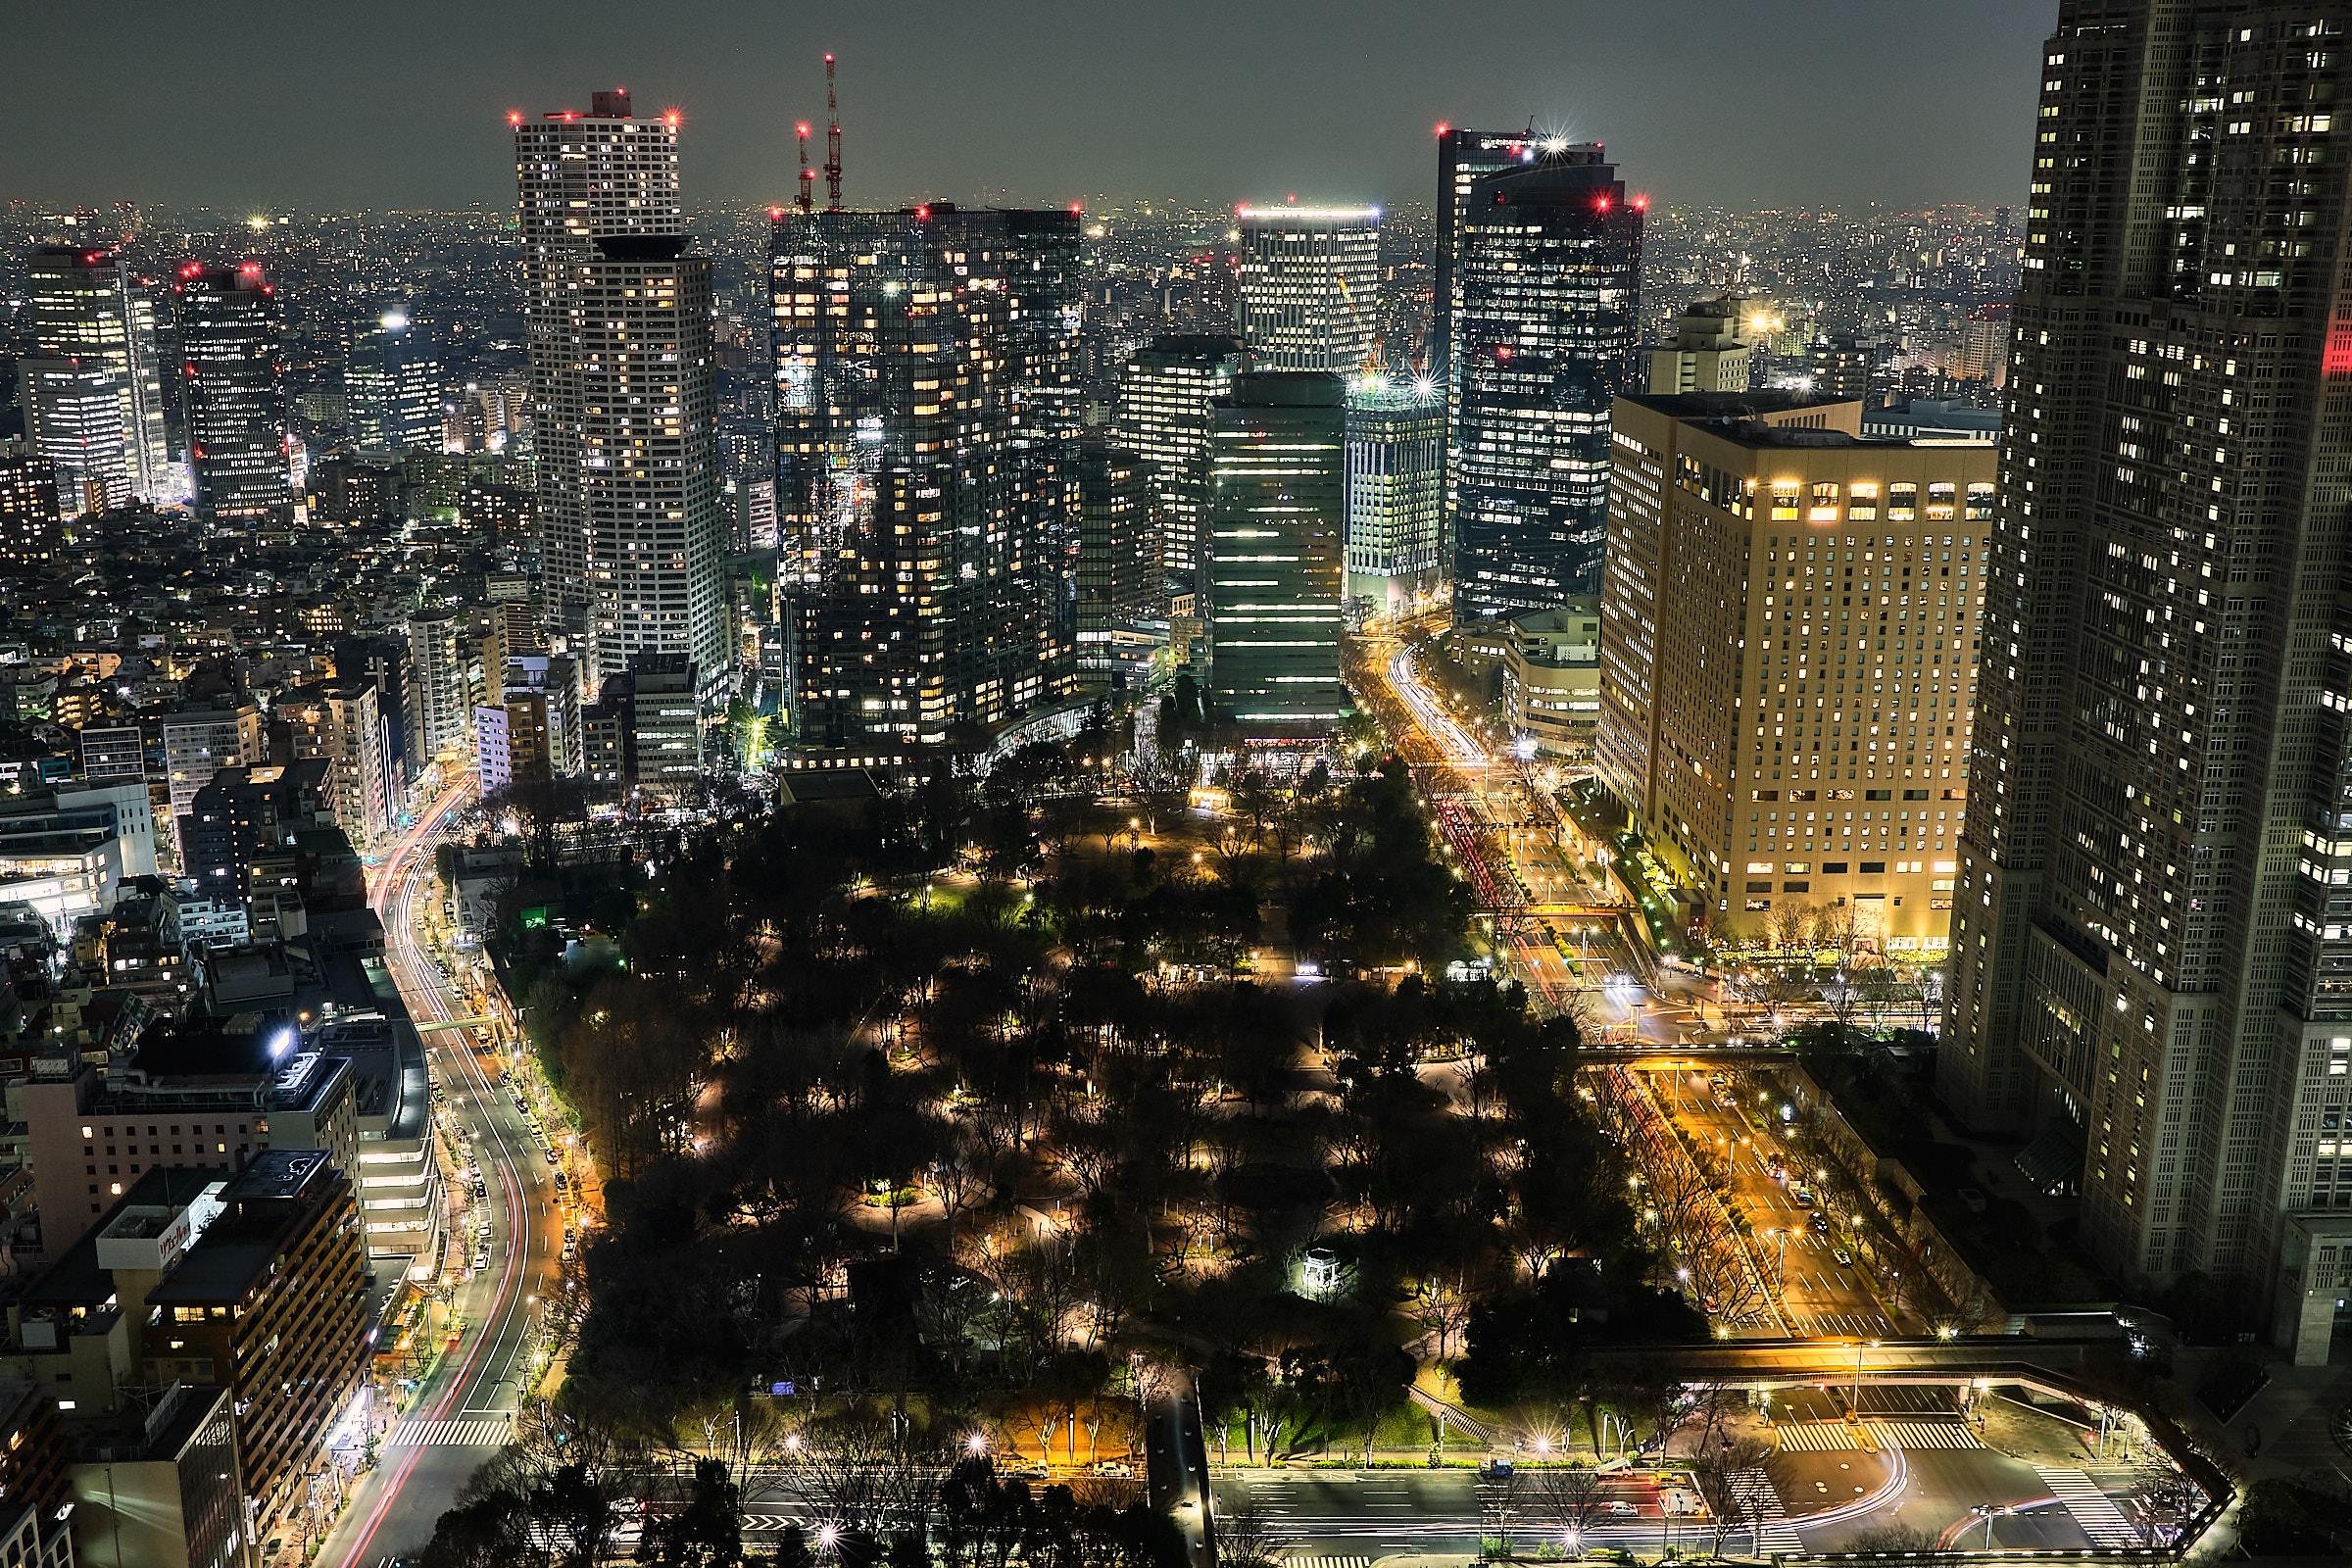 Shinjuku Park Tower